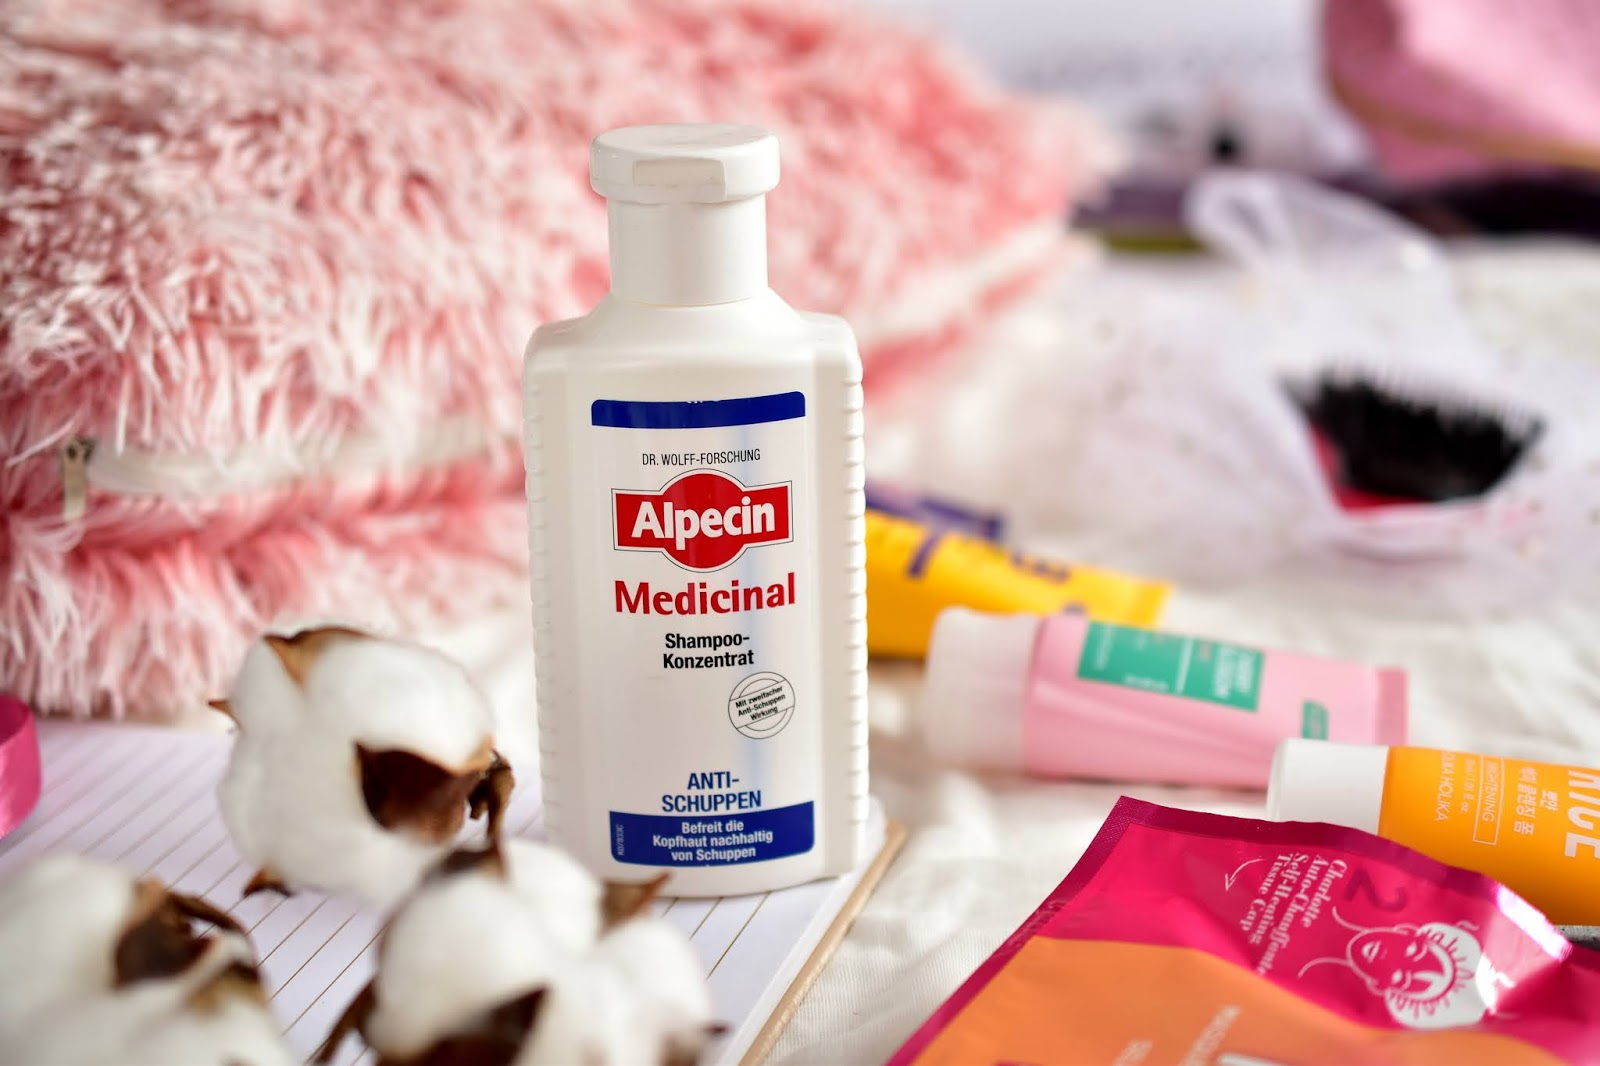 Alpecin Medicinal